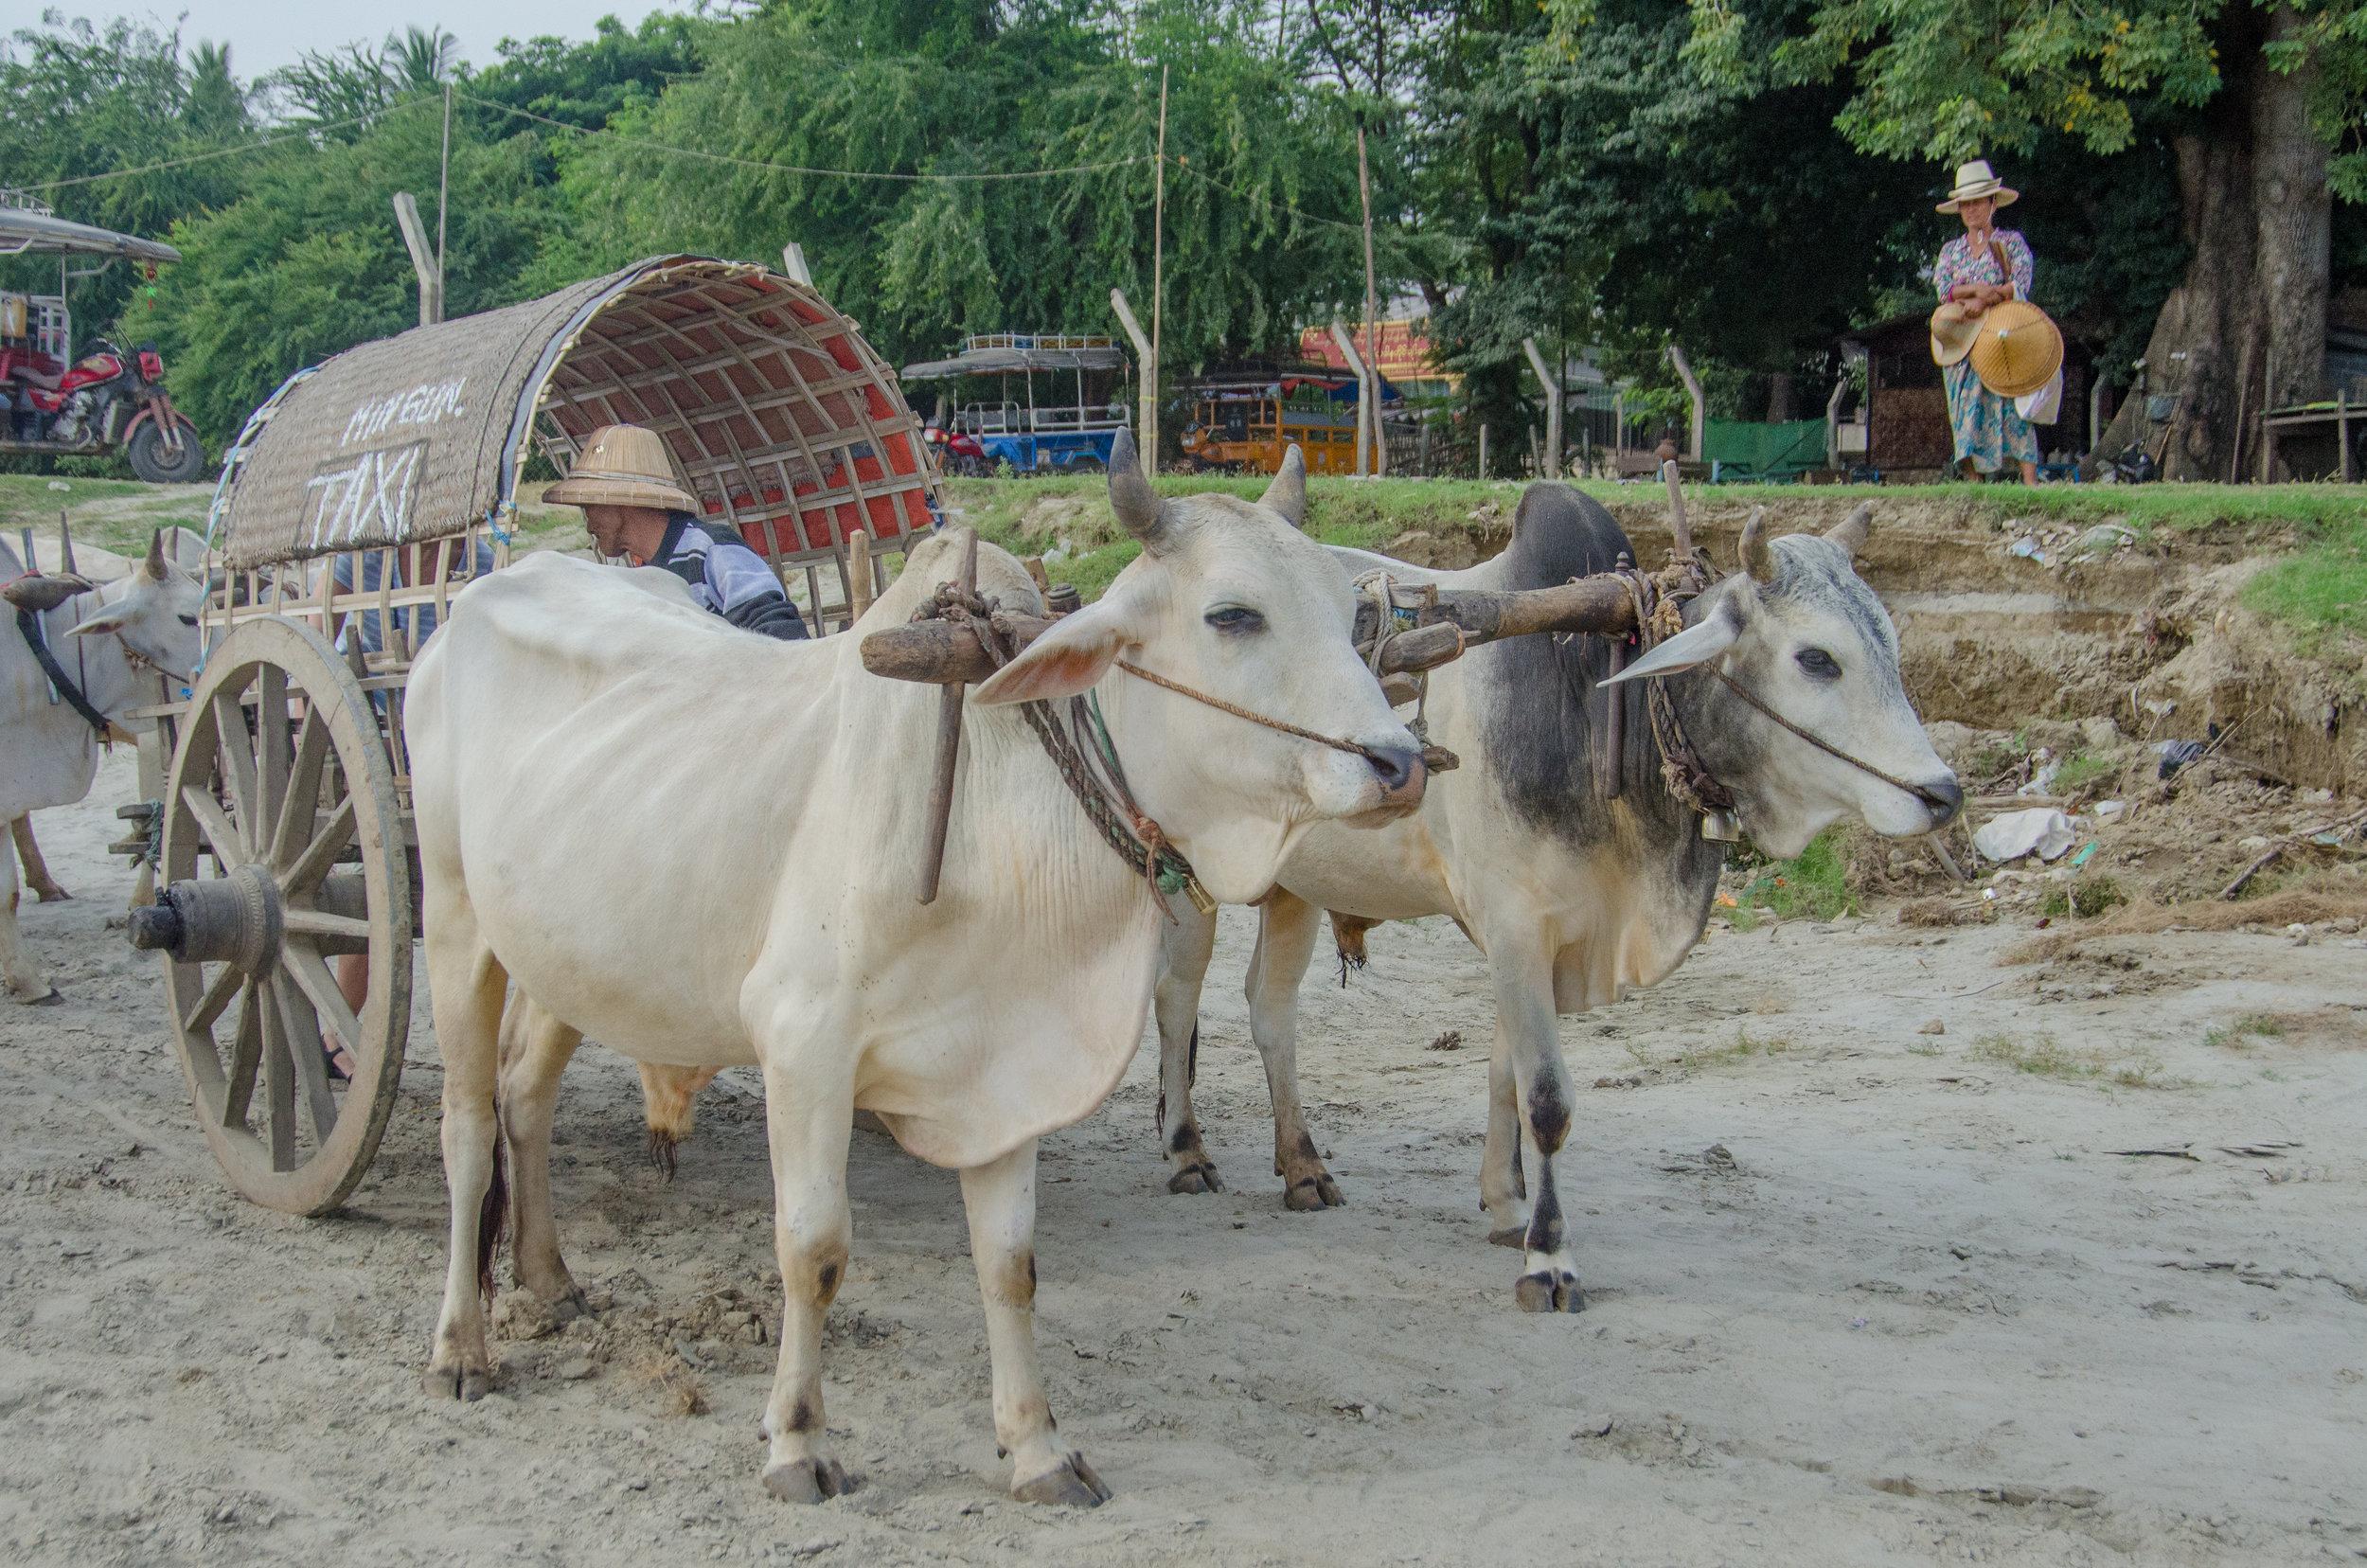 Ox taxi, Mingun, Mandalay, Myanmar